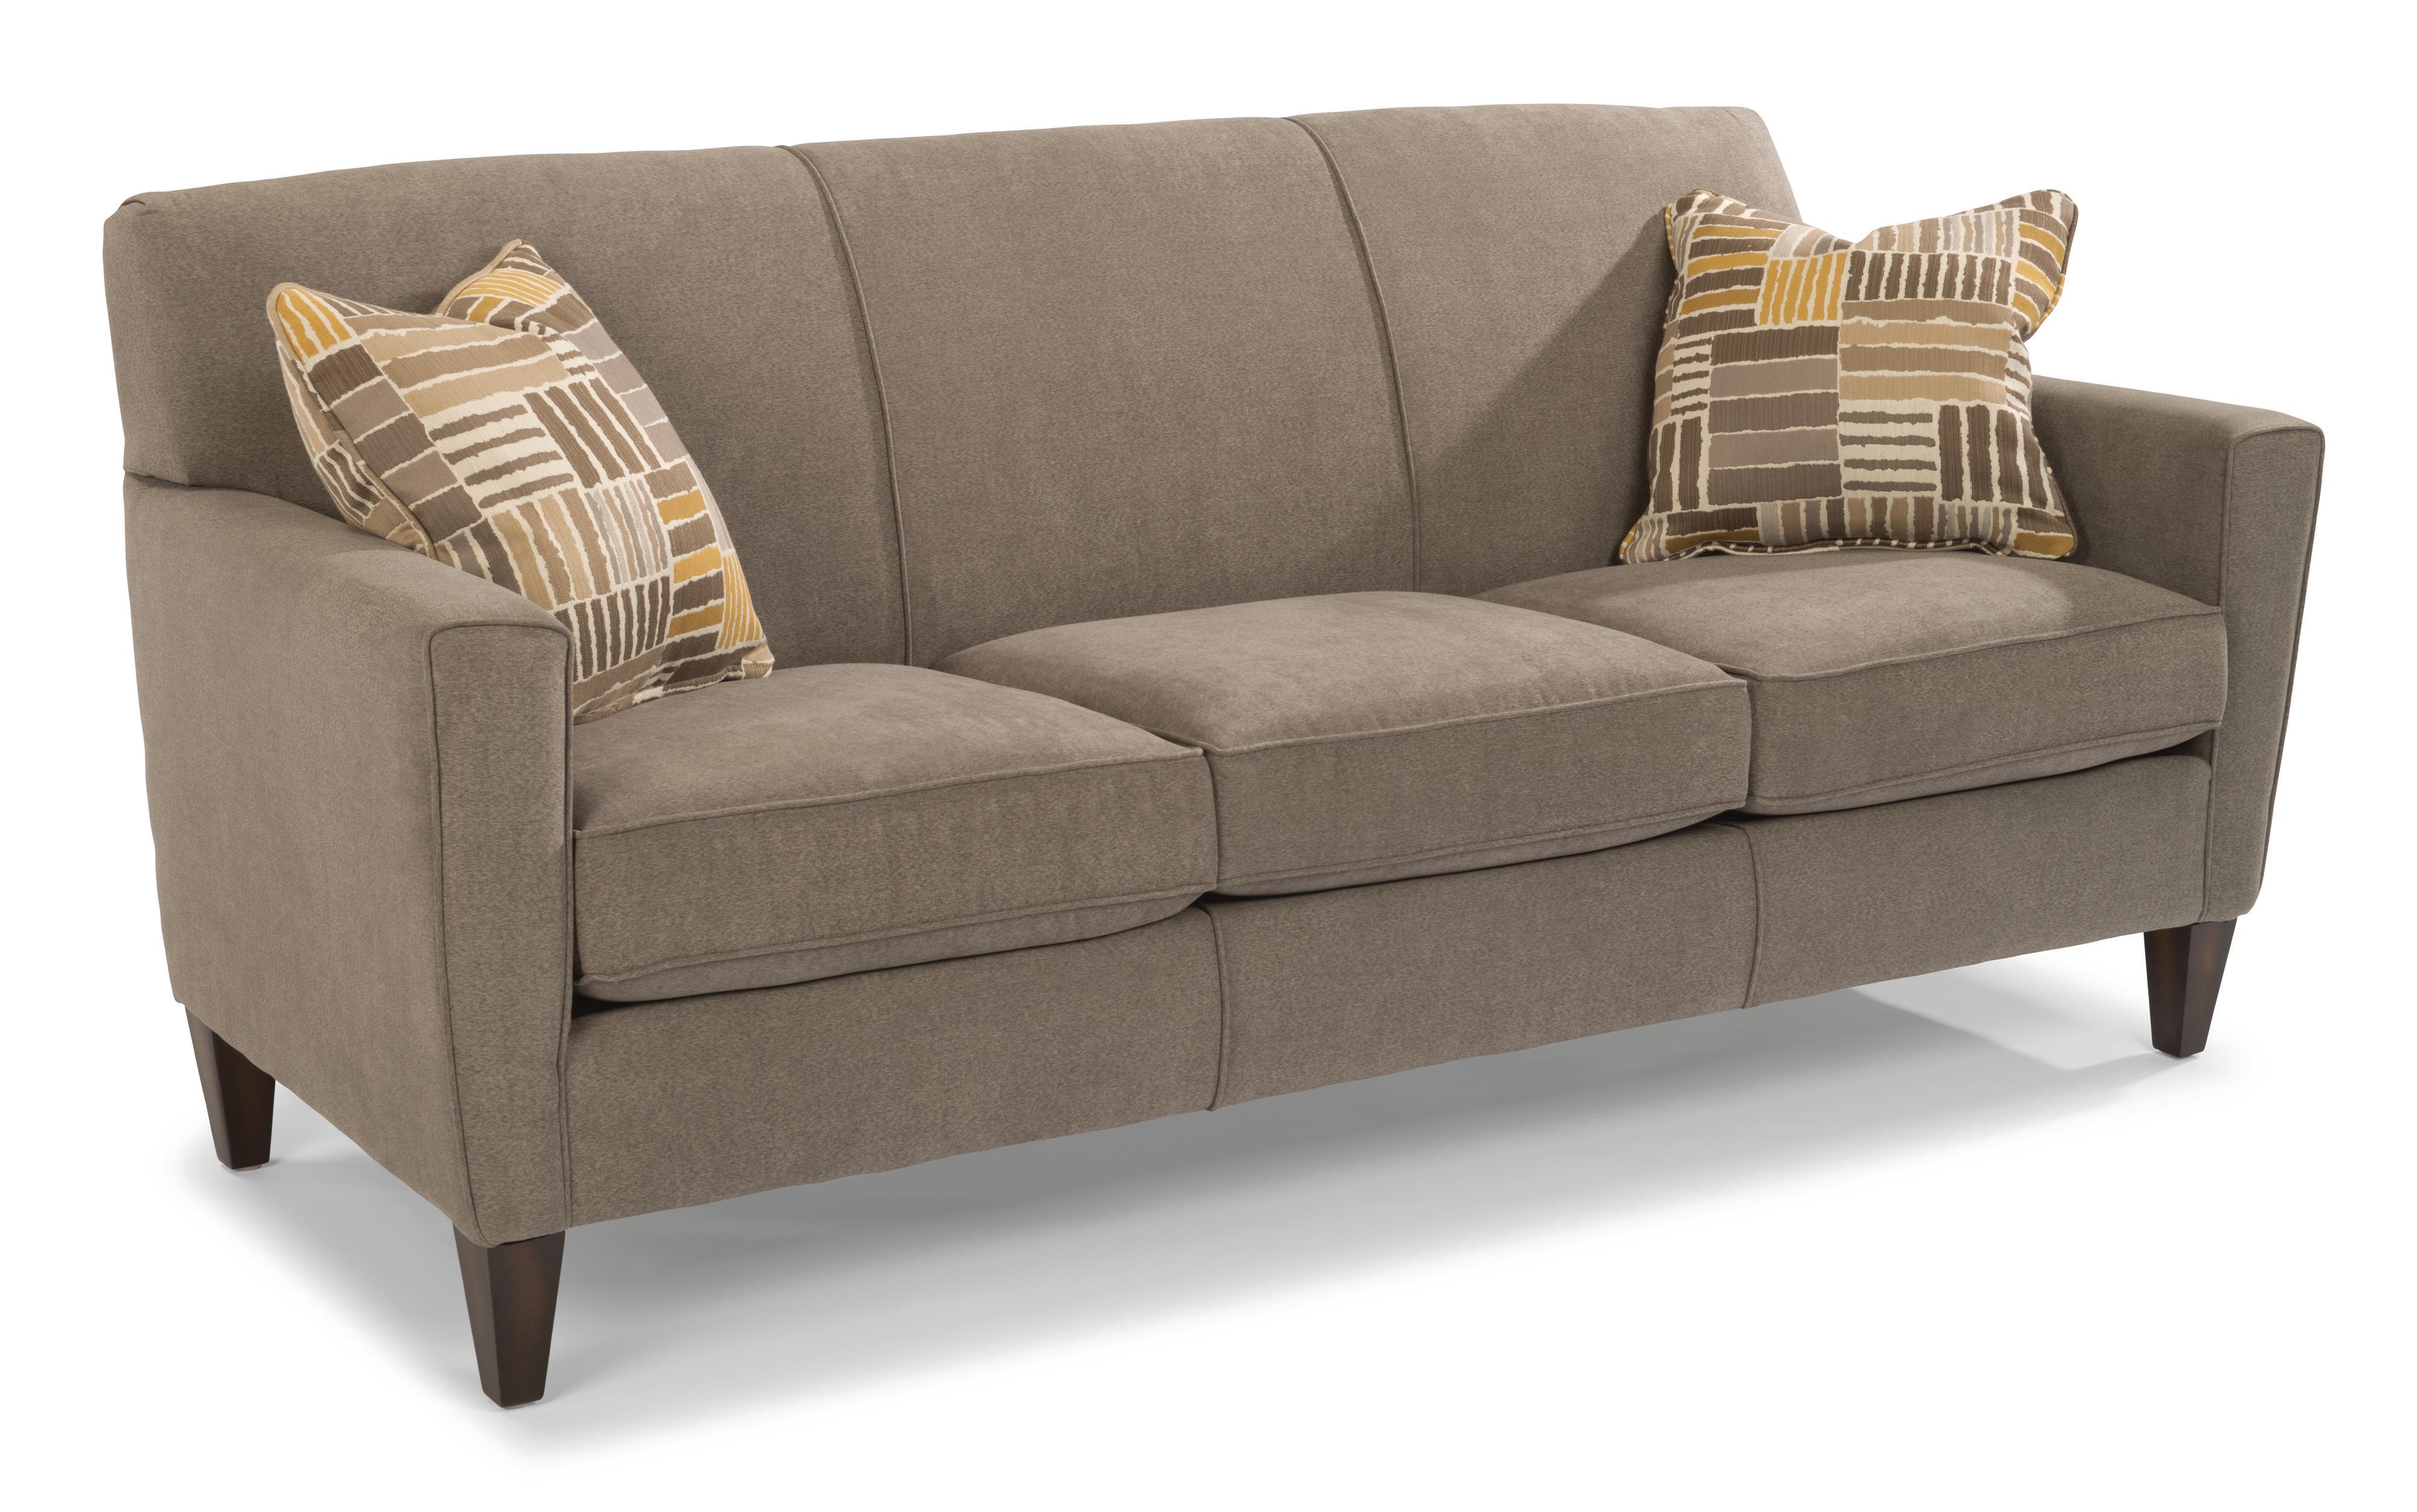 Flexsteel Digby Upholstered Sofa Fashion Furniture Sofas